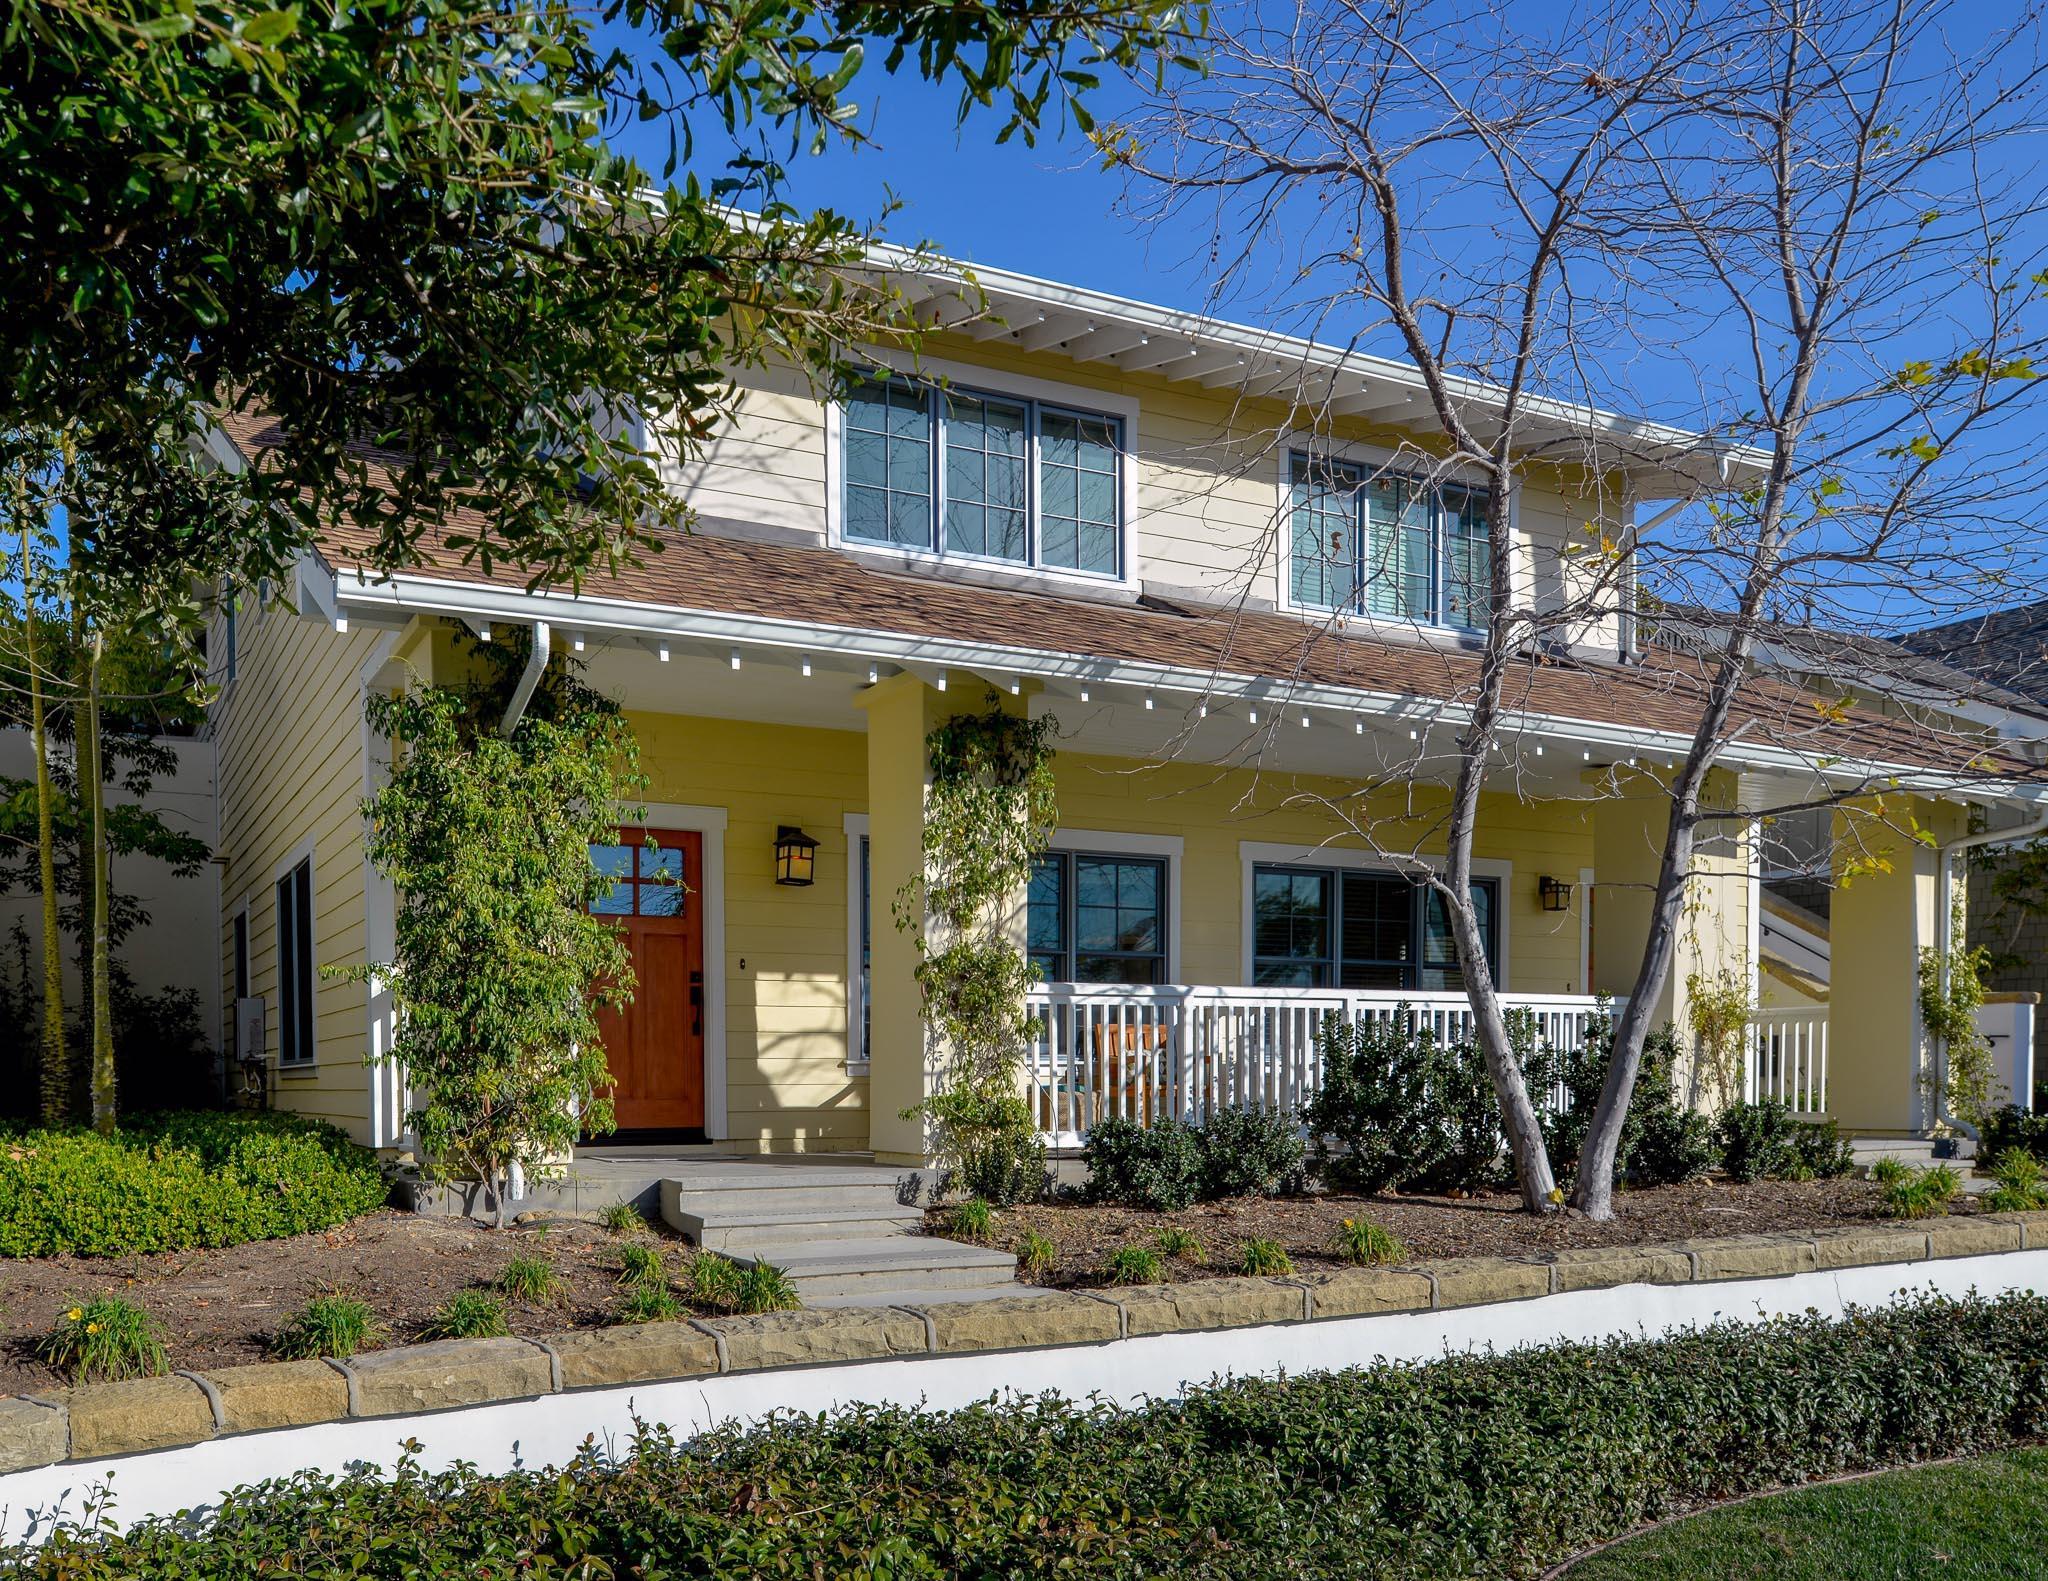 601 E Micheltorena St, Santa Barbara, California